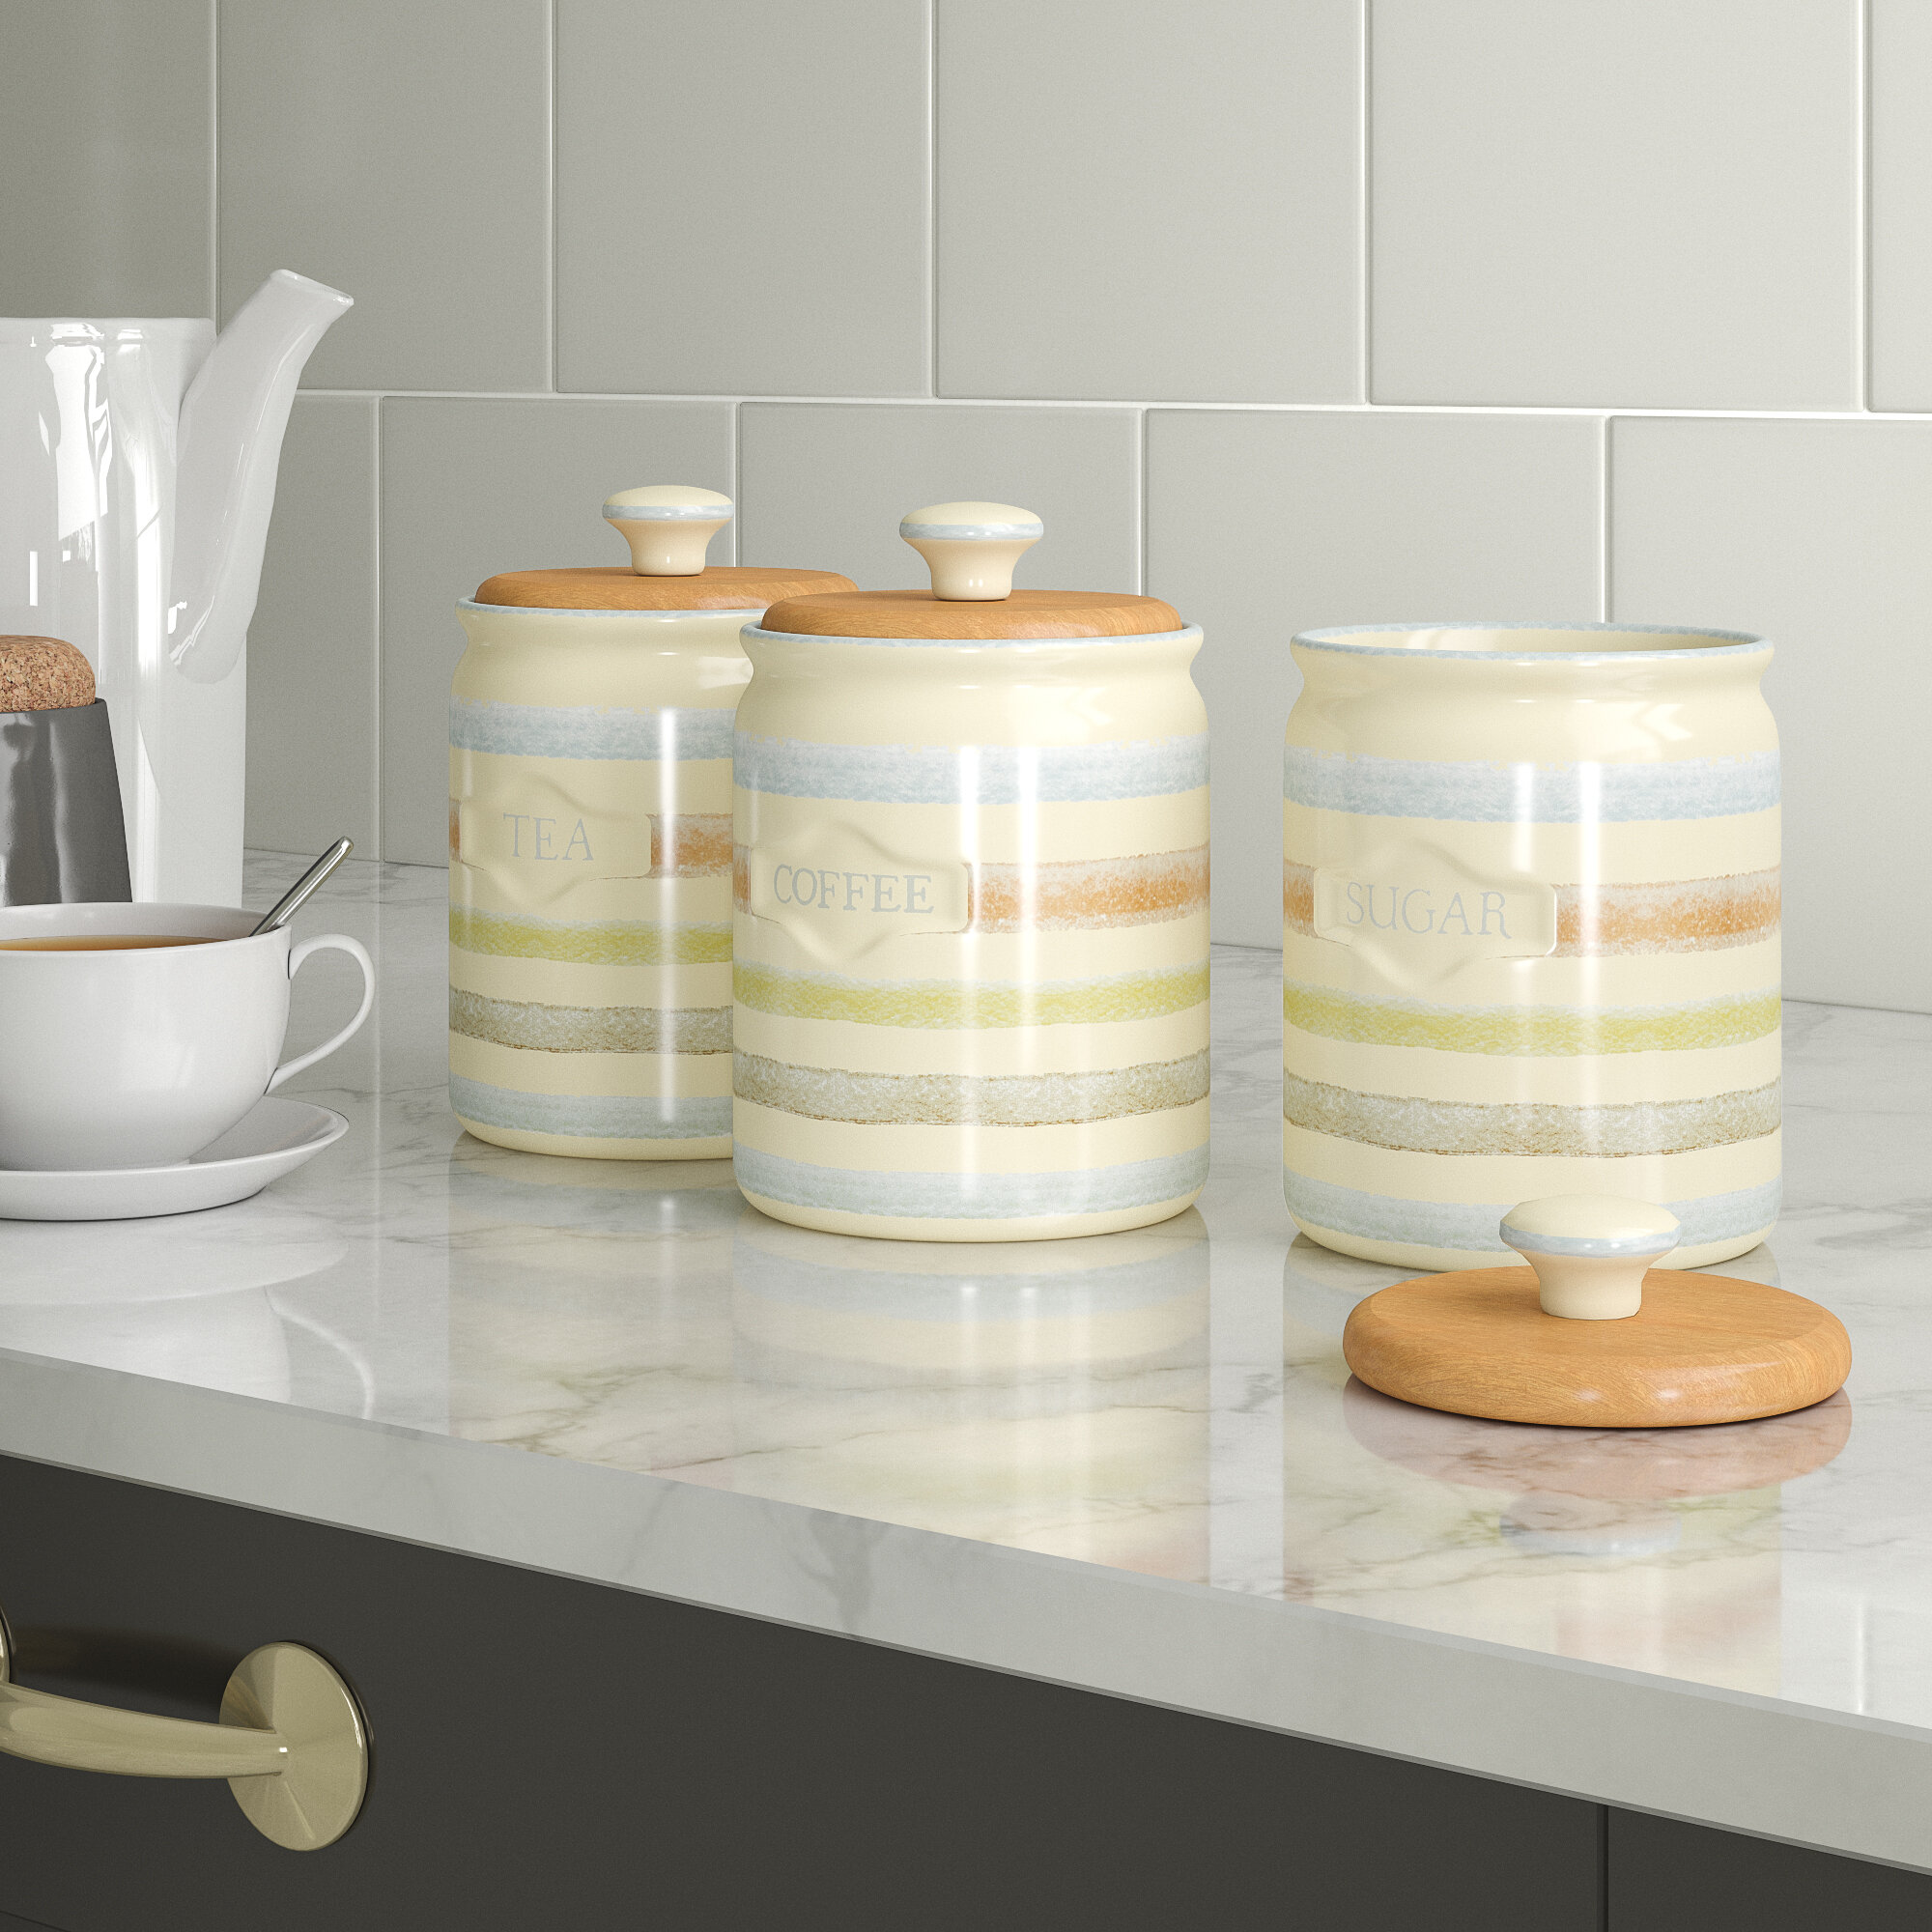 5a58a6dbb57 KitchenCraft Classic Striped 3 Piece Ceramic Coffee, Tea, & Sugar Set &  Reviews | Wayfair.co.uk